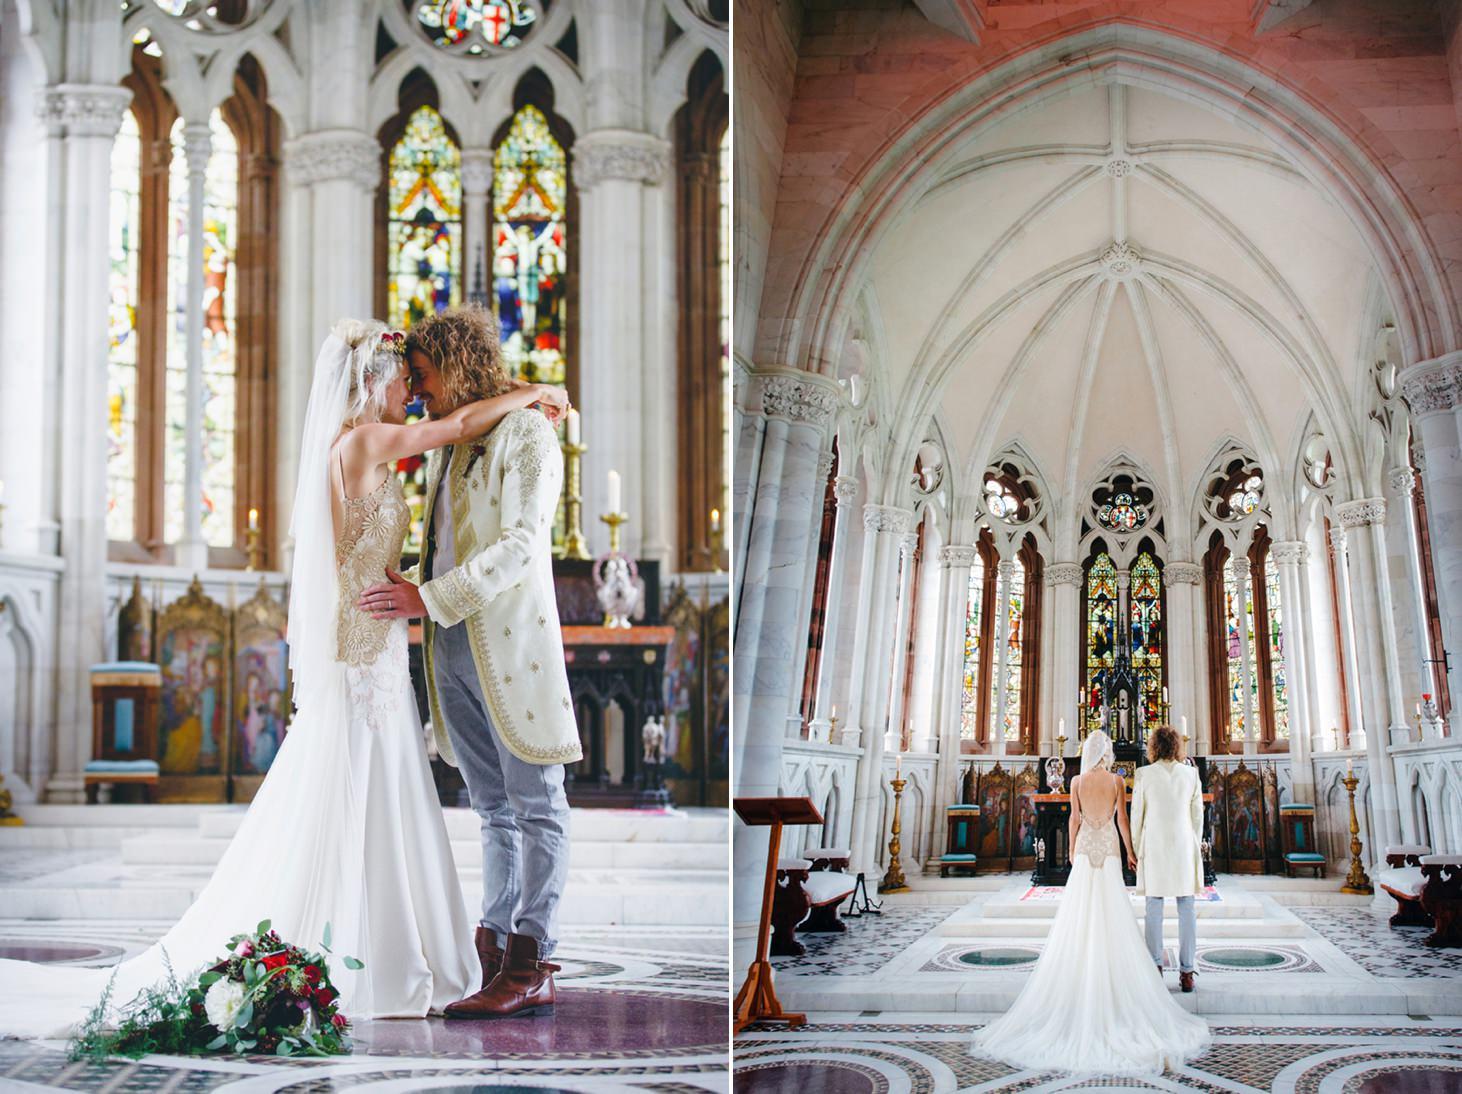 mount stuart wedding photography bride and groom together